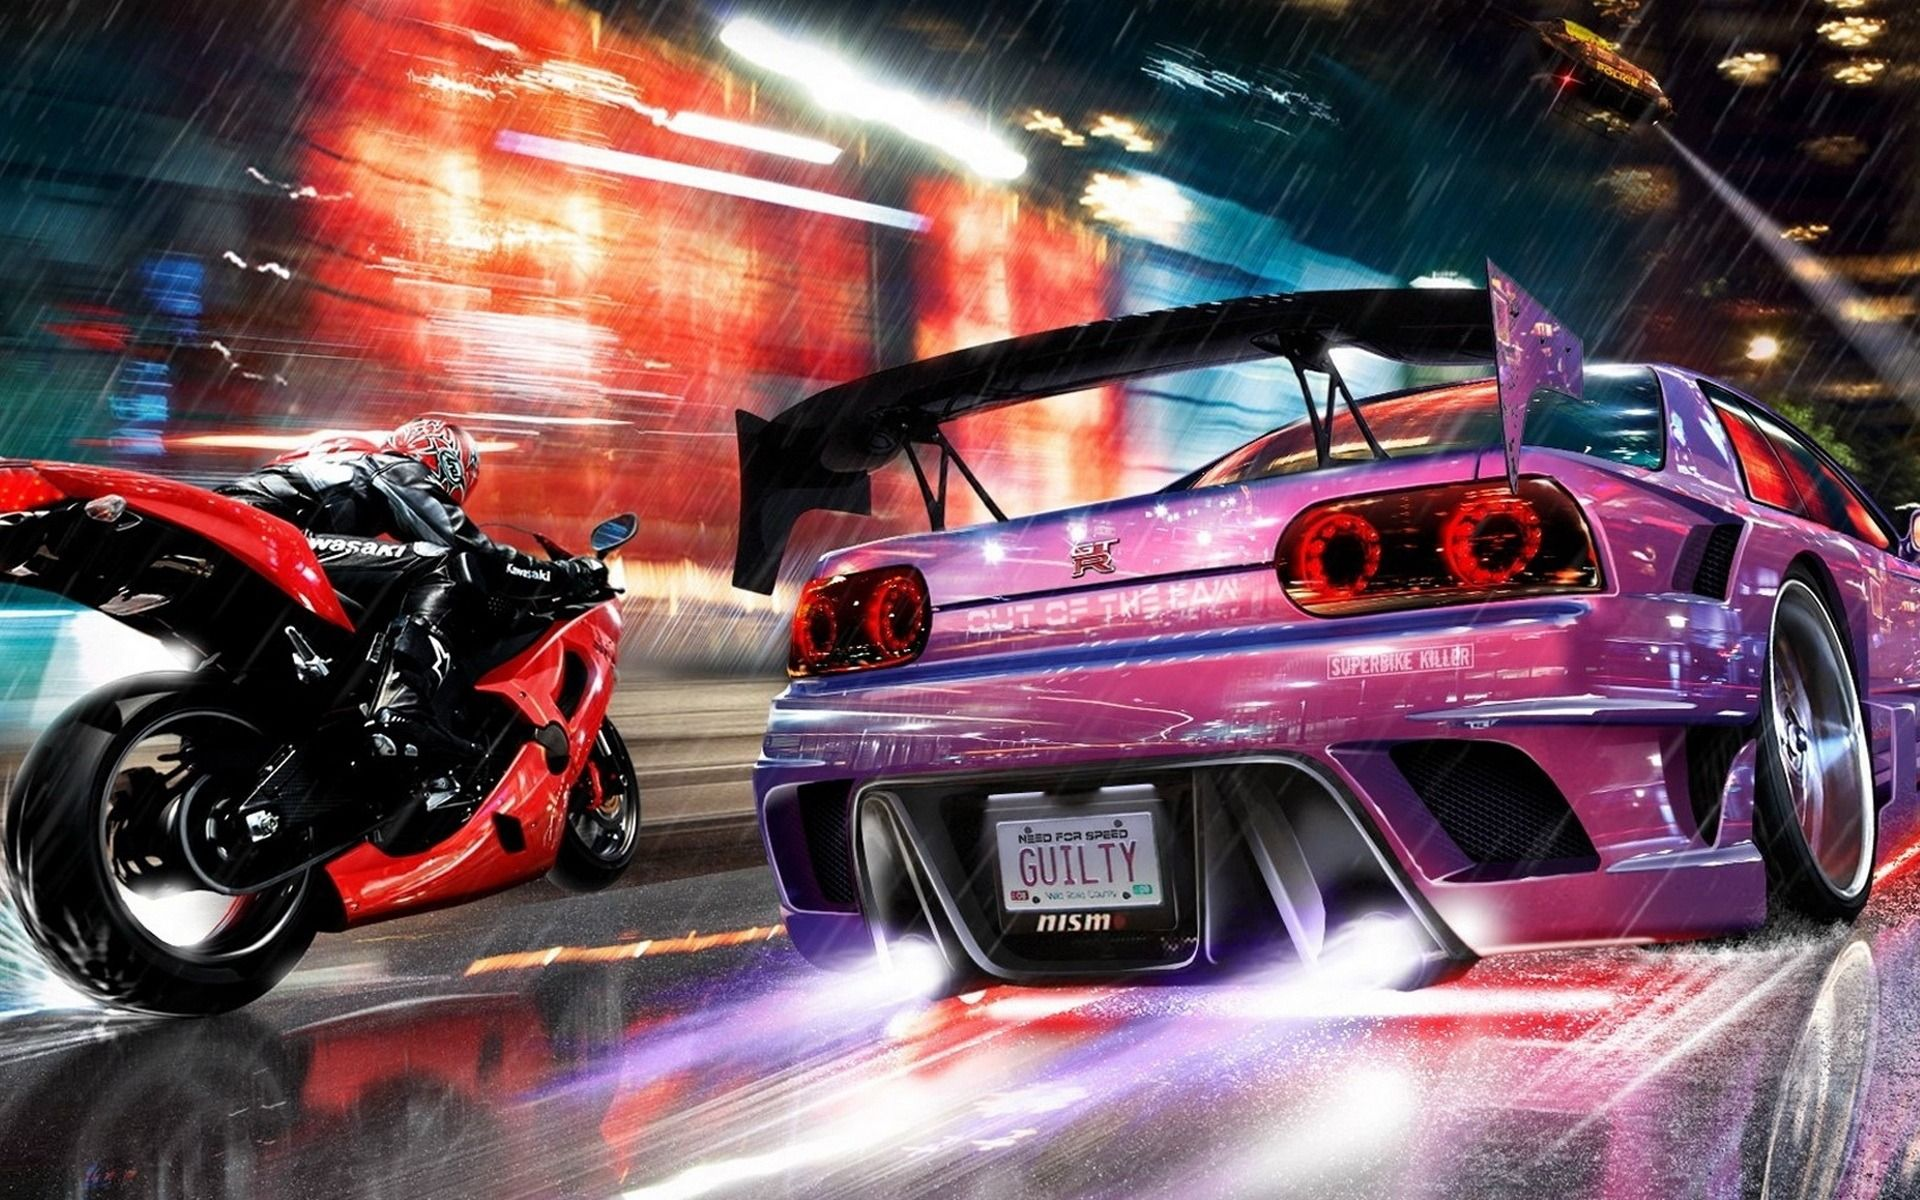 Desktophdwallpaper Org Car Wallpapers Cars Music Nissan Gtr